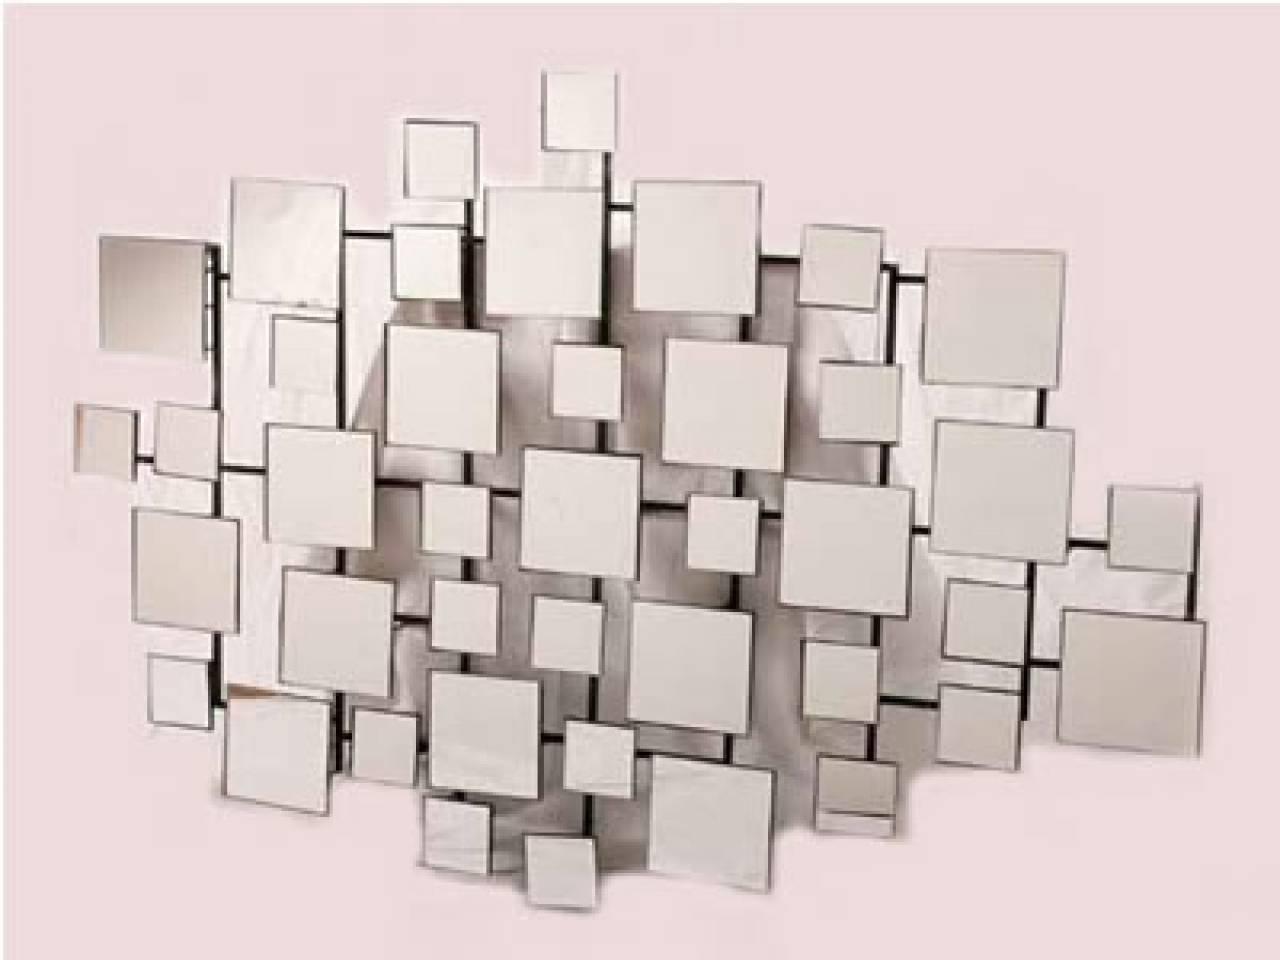 Wall Art Designs: Mirrored Wall Art Metal Mirror Wall Art Mirrored Intended For 2017 Abstract Mirror Wall Art (View 7 of 15)